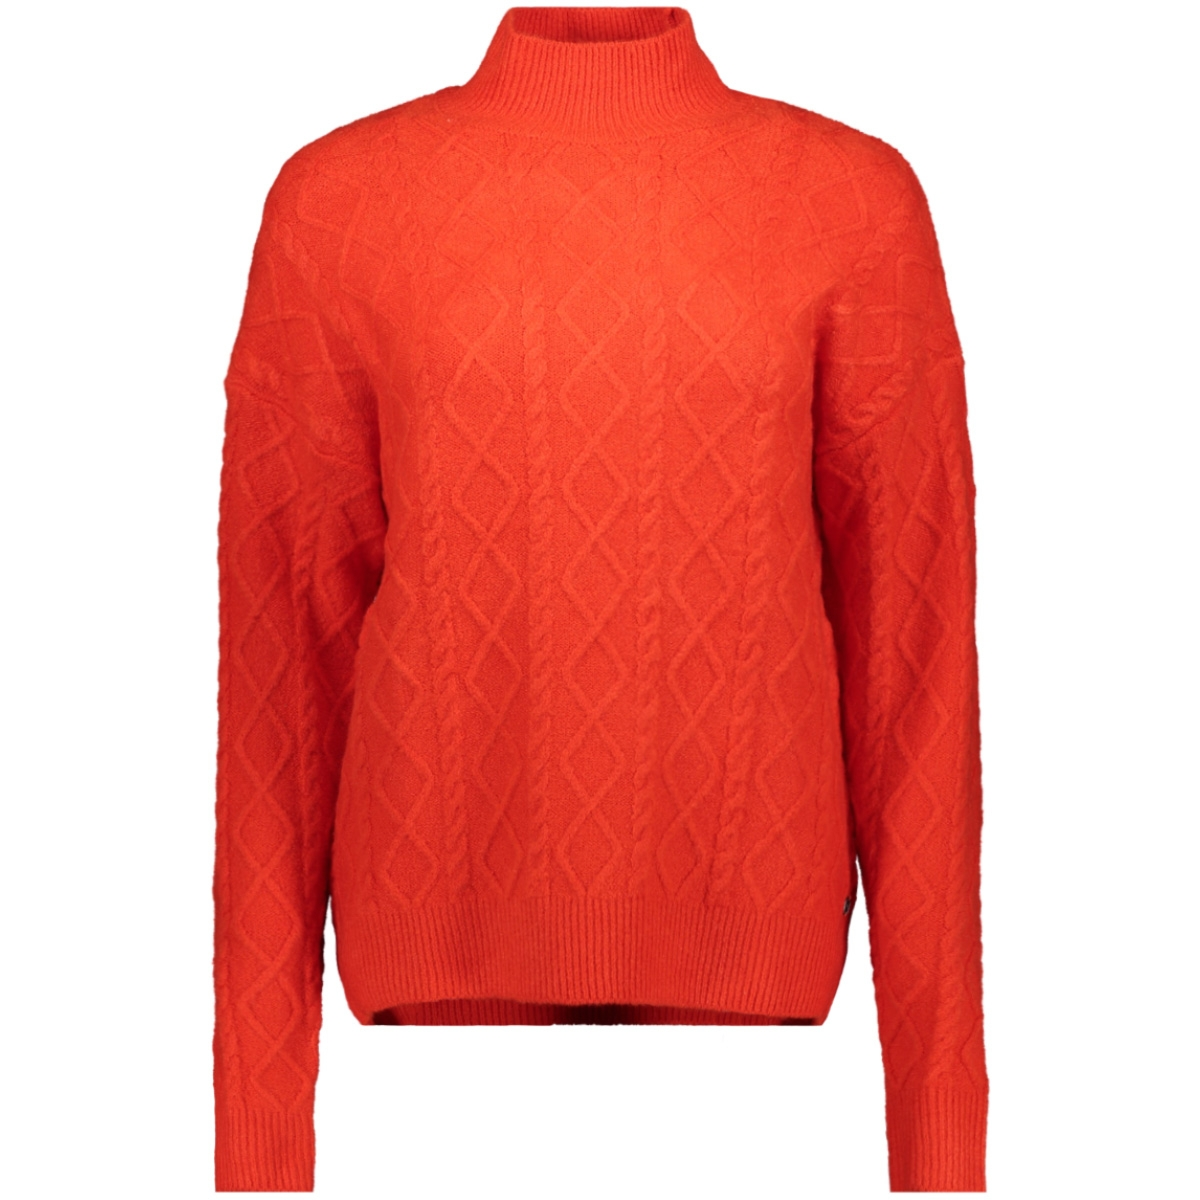 trui met cable knit j90248 garcia trui 1220 red orange